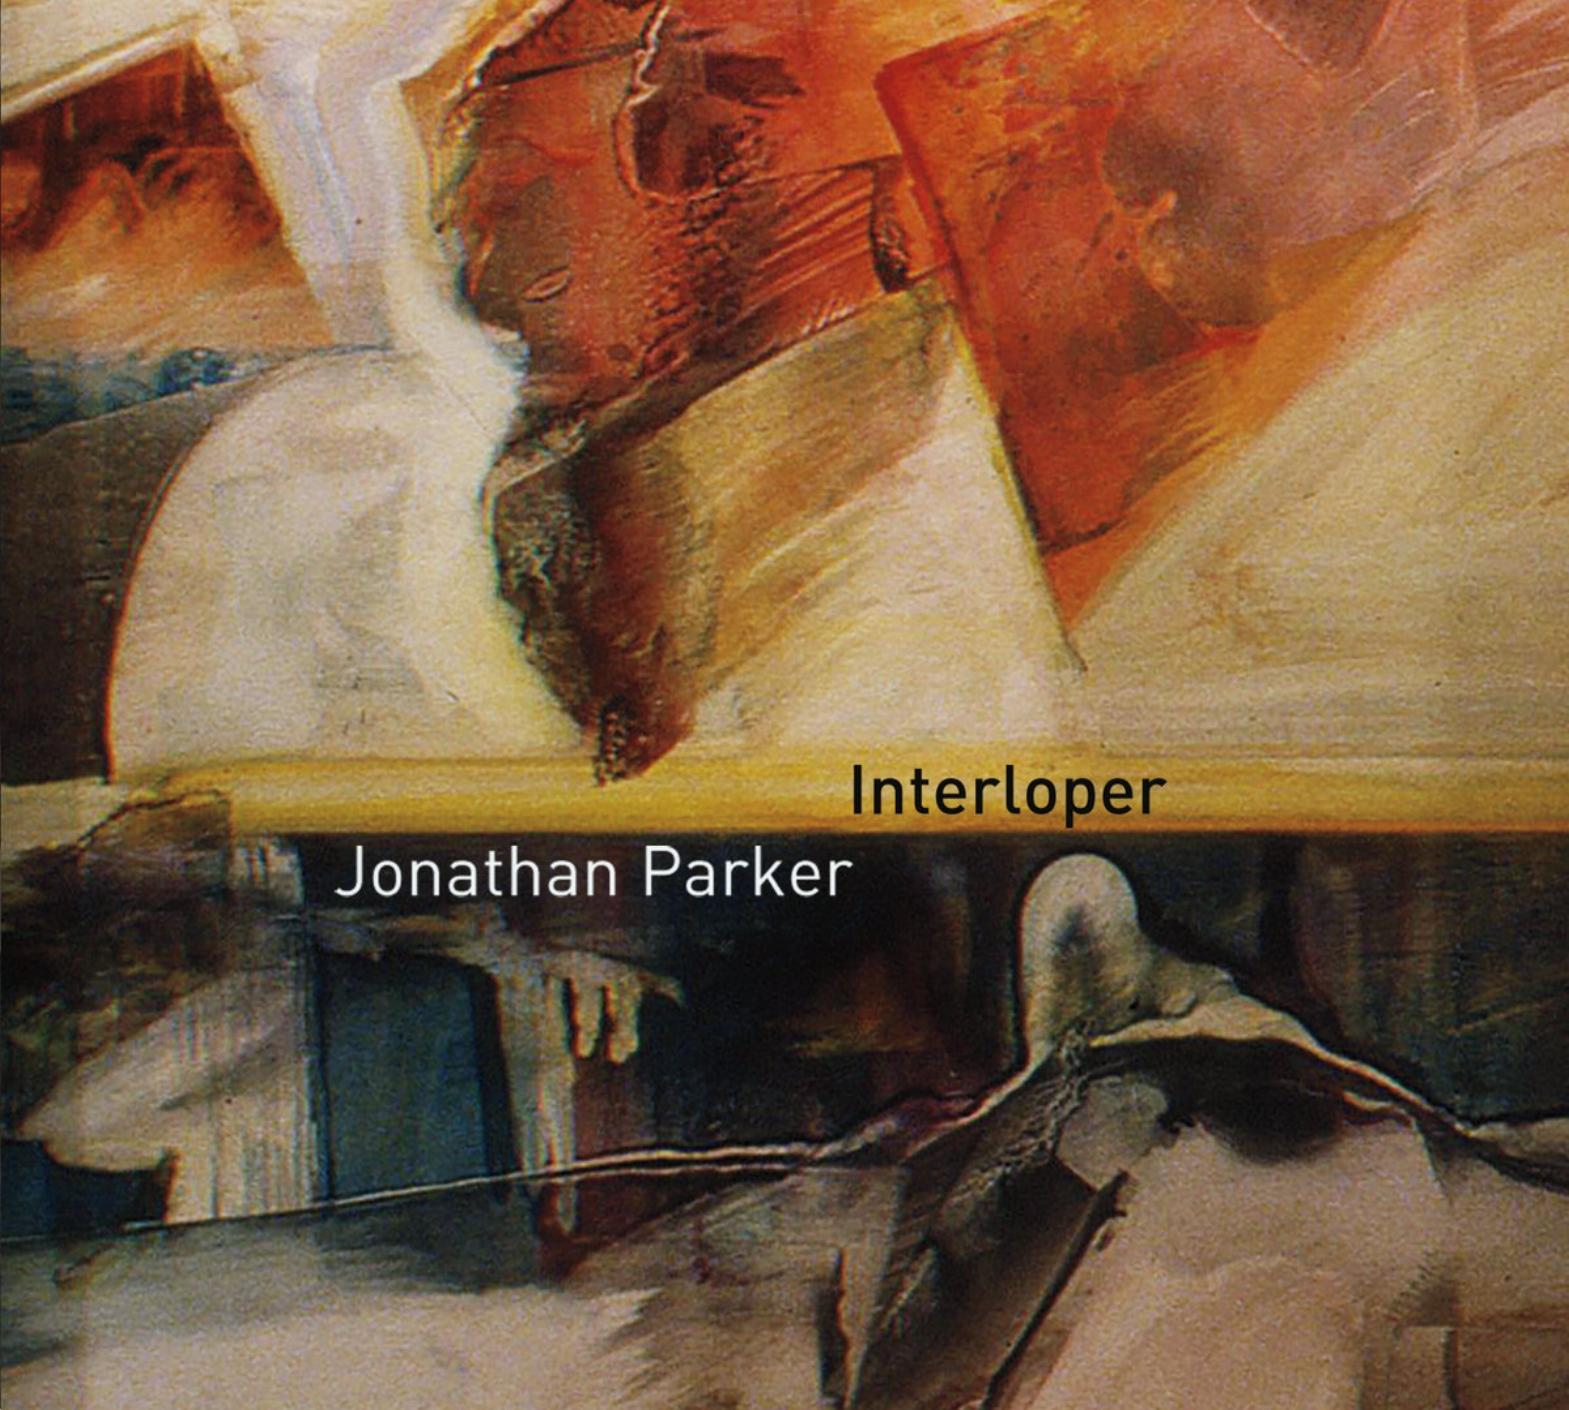 Interloper  (2015) Jonathan Parker   Bandcamp